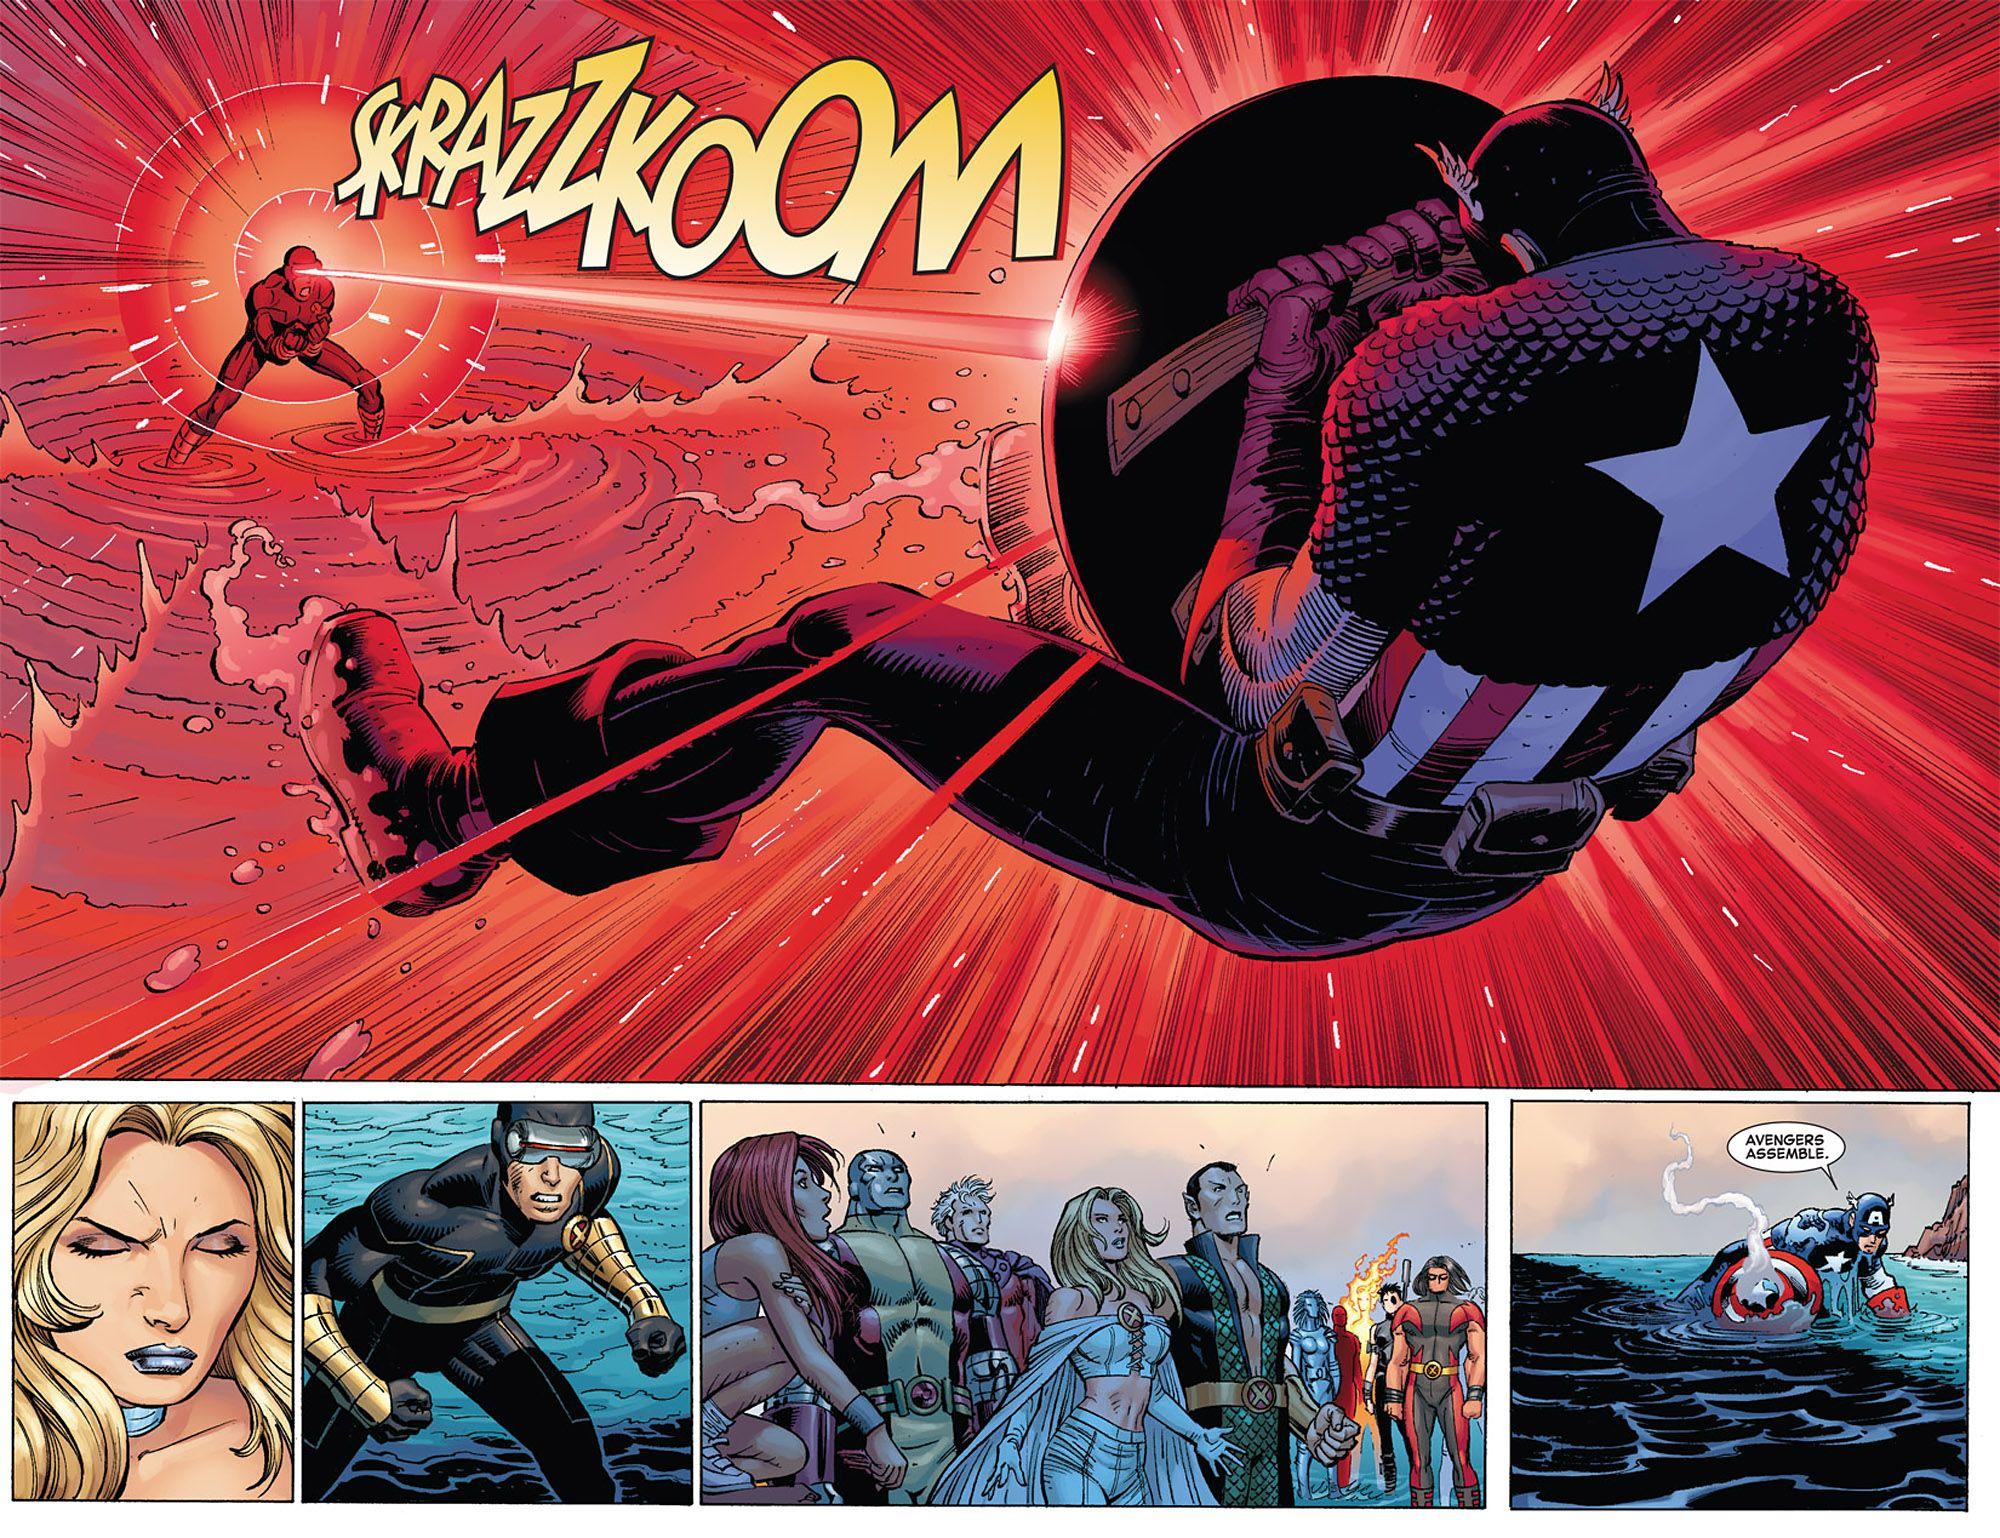 Cyclops Vs Captain America X Men Vs Avengers Http Insidepulse Com Wp Content Uploads 2012 04 031 Jpg Cyclops Marvel Best Comic Books Comic Heroes